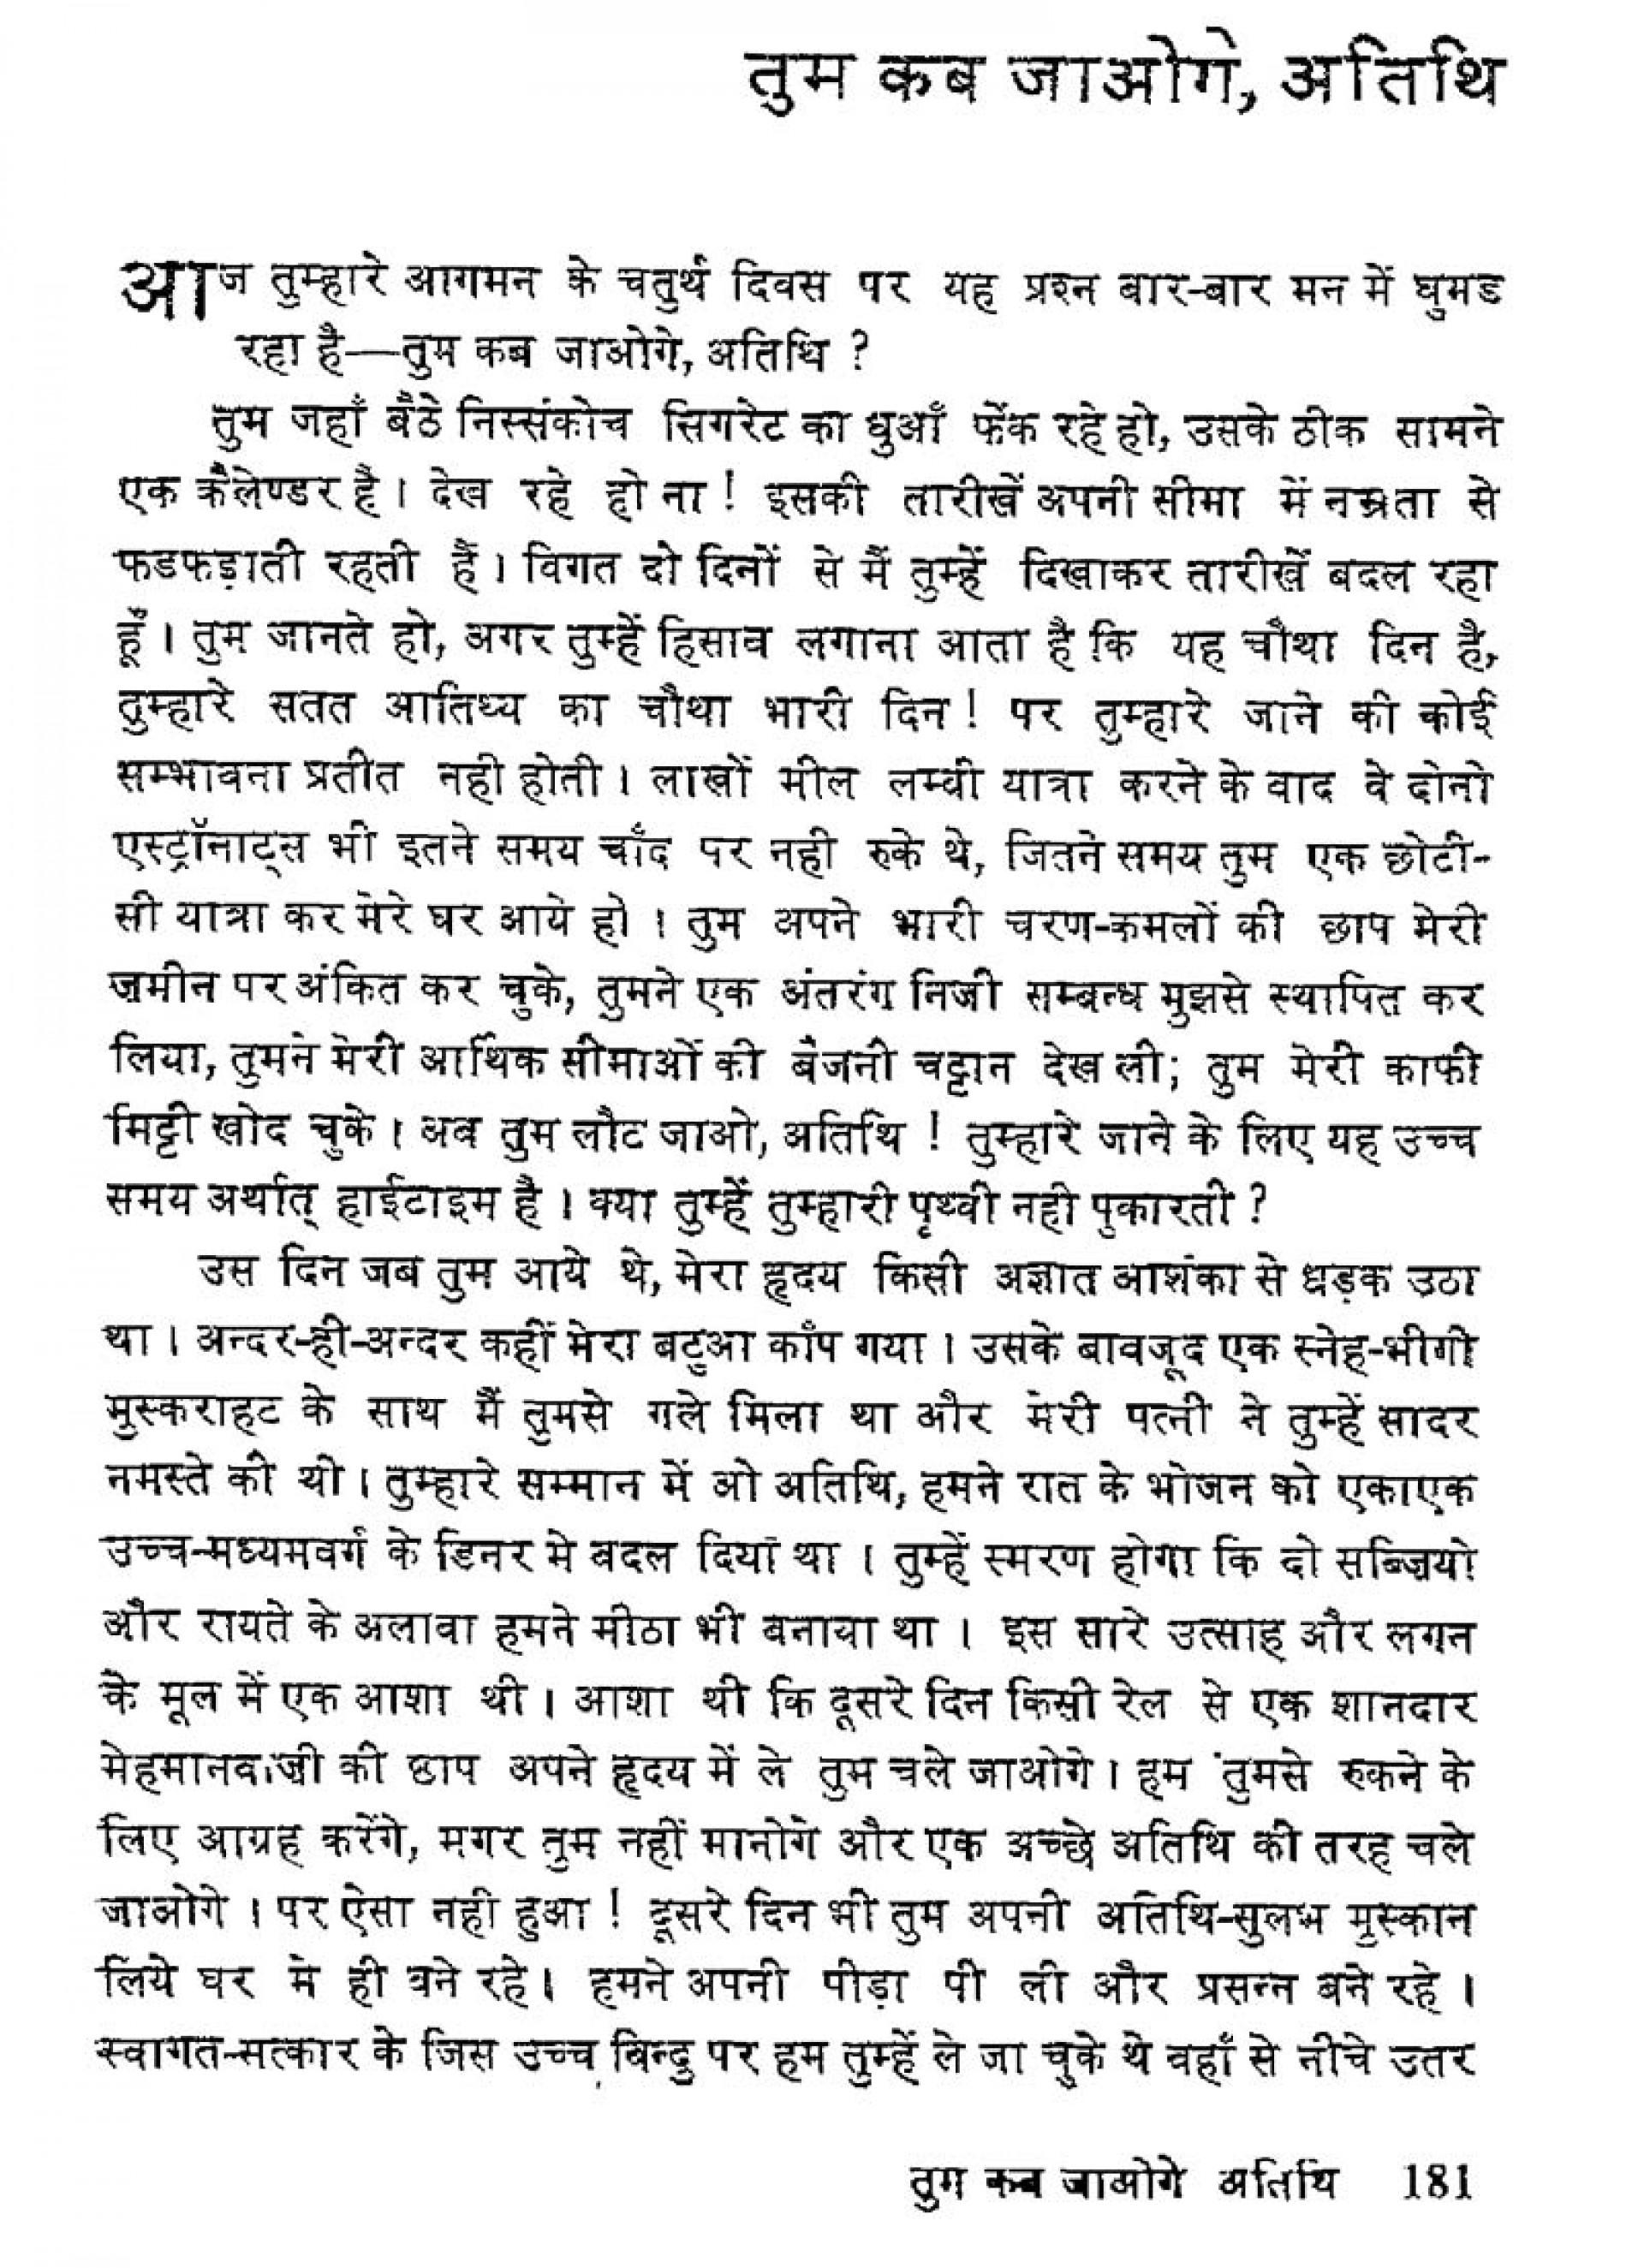 008 Water Life Essay Atkj On Save In Punjabi Language Hindi And Electricity Marathi Essays For Class Wikipedia Words Stunning 300 1920